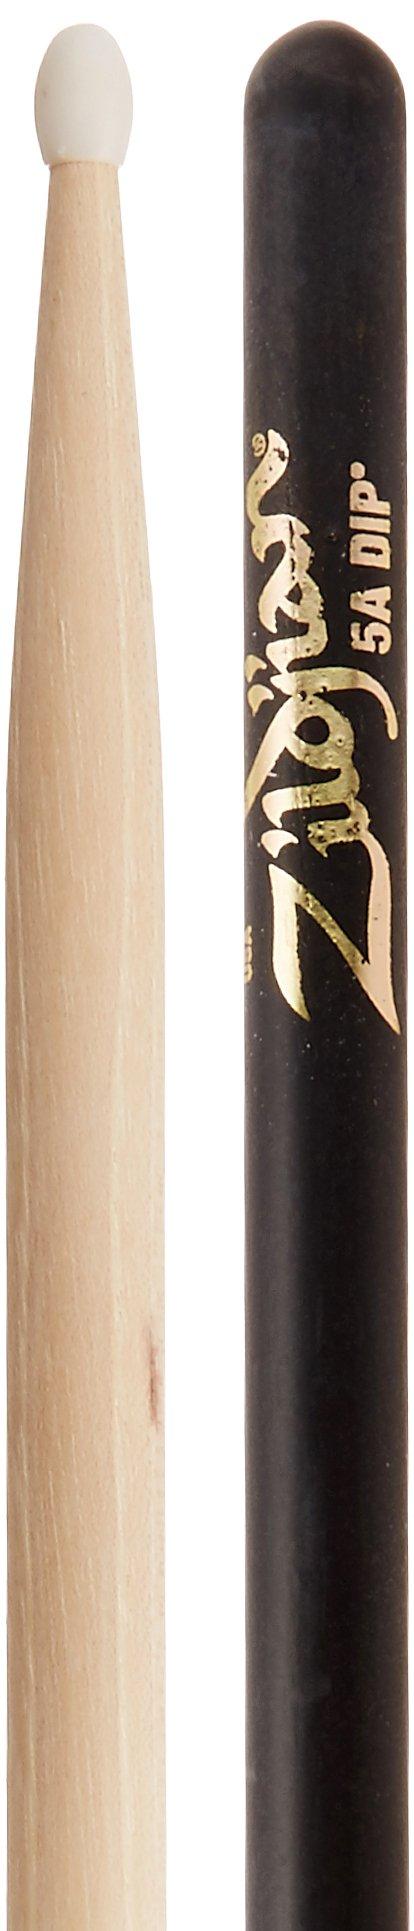 Zildjian 5A Nylon Black Dip Drumsticks